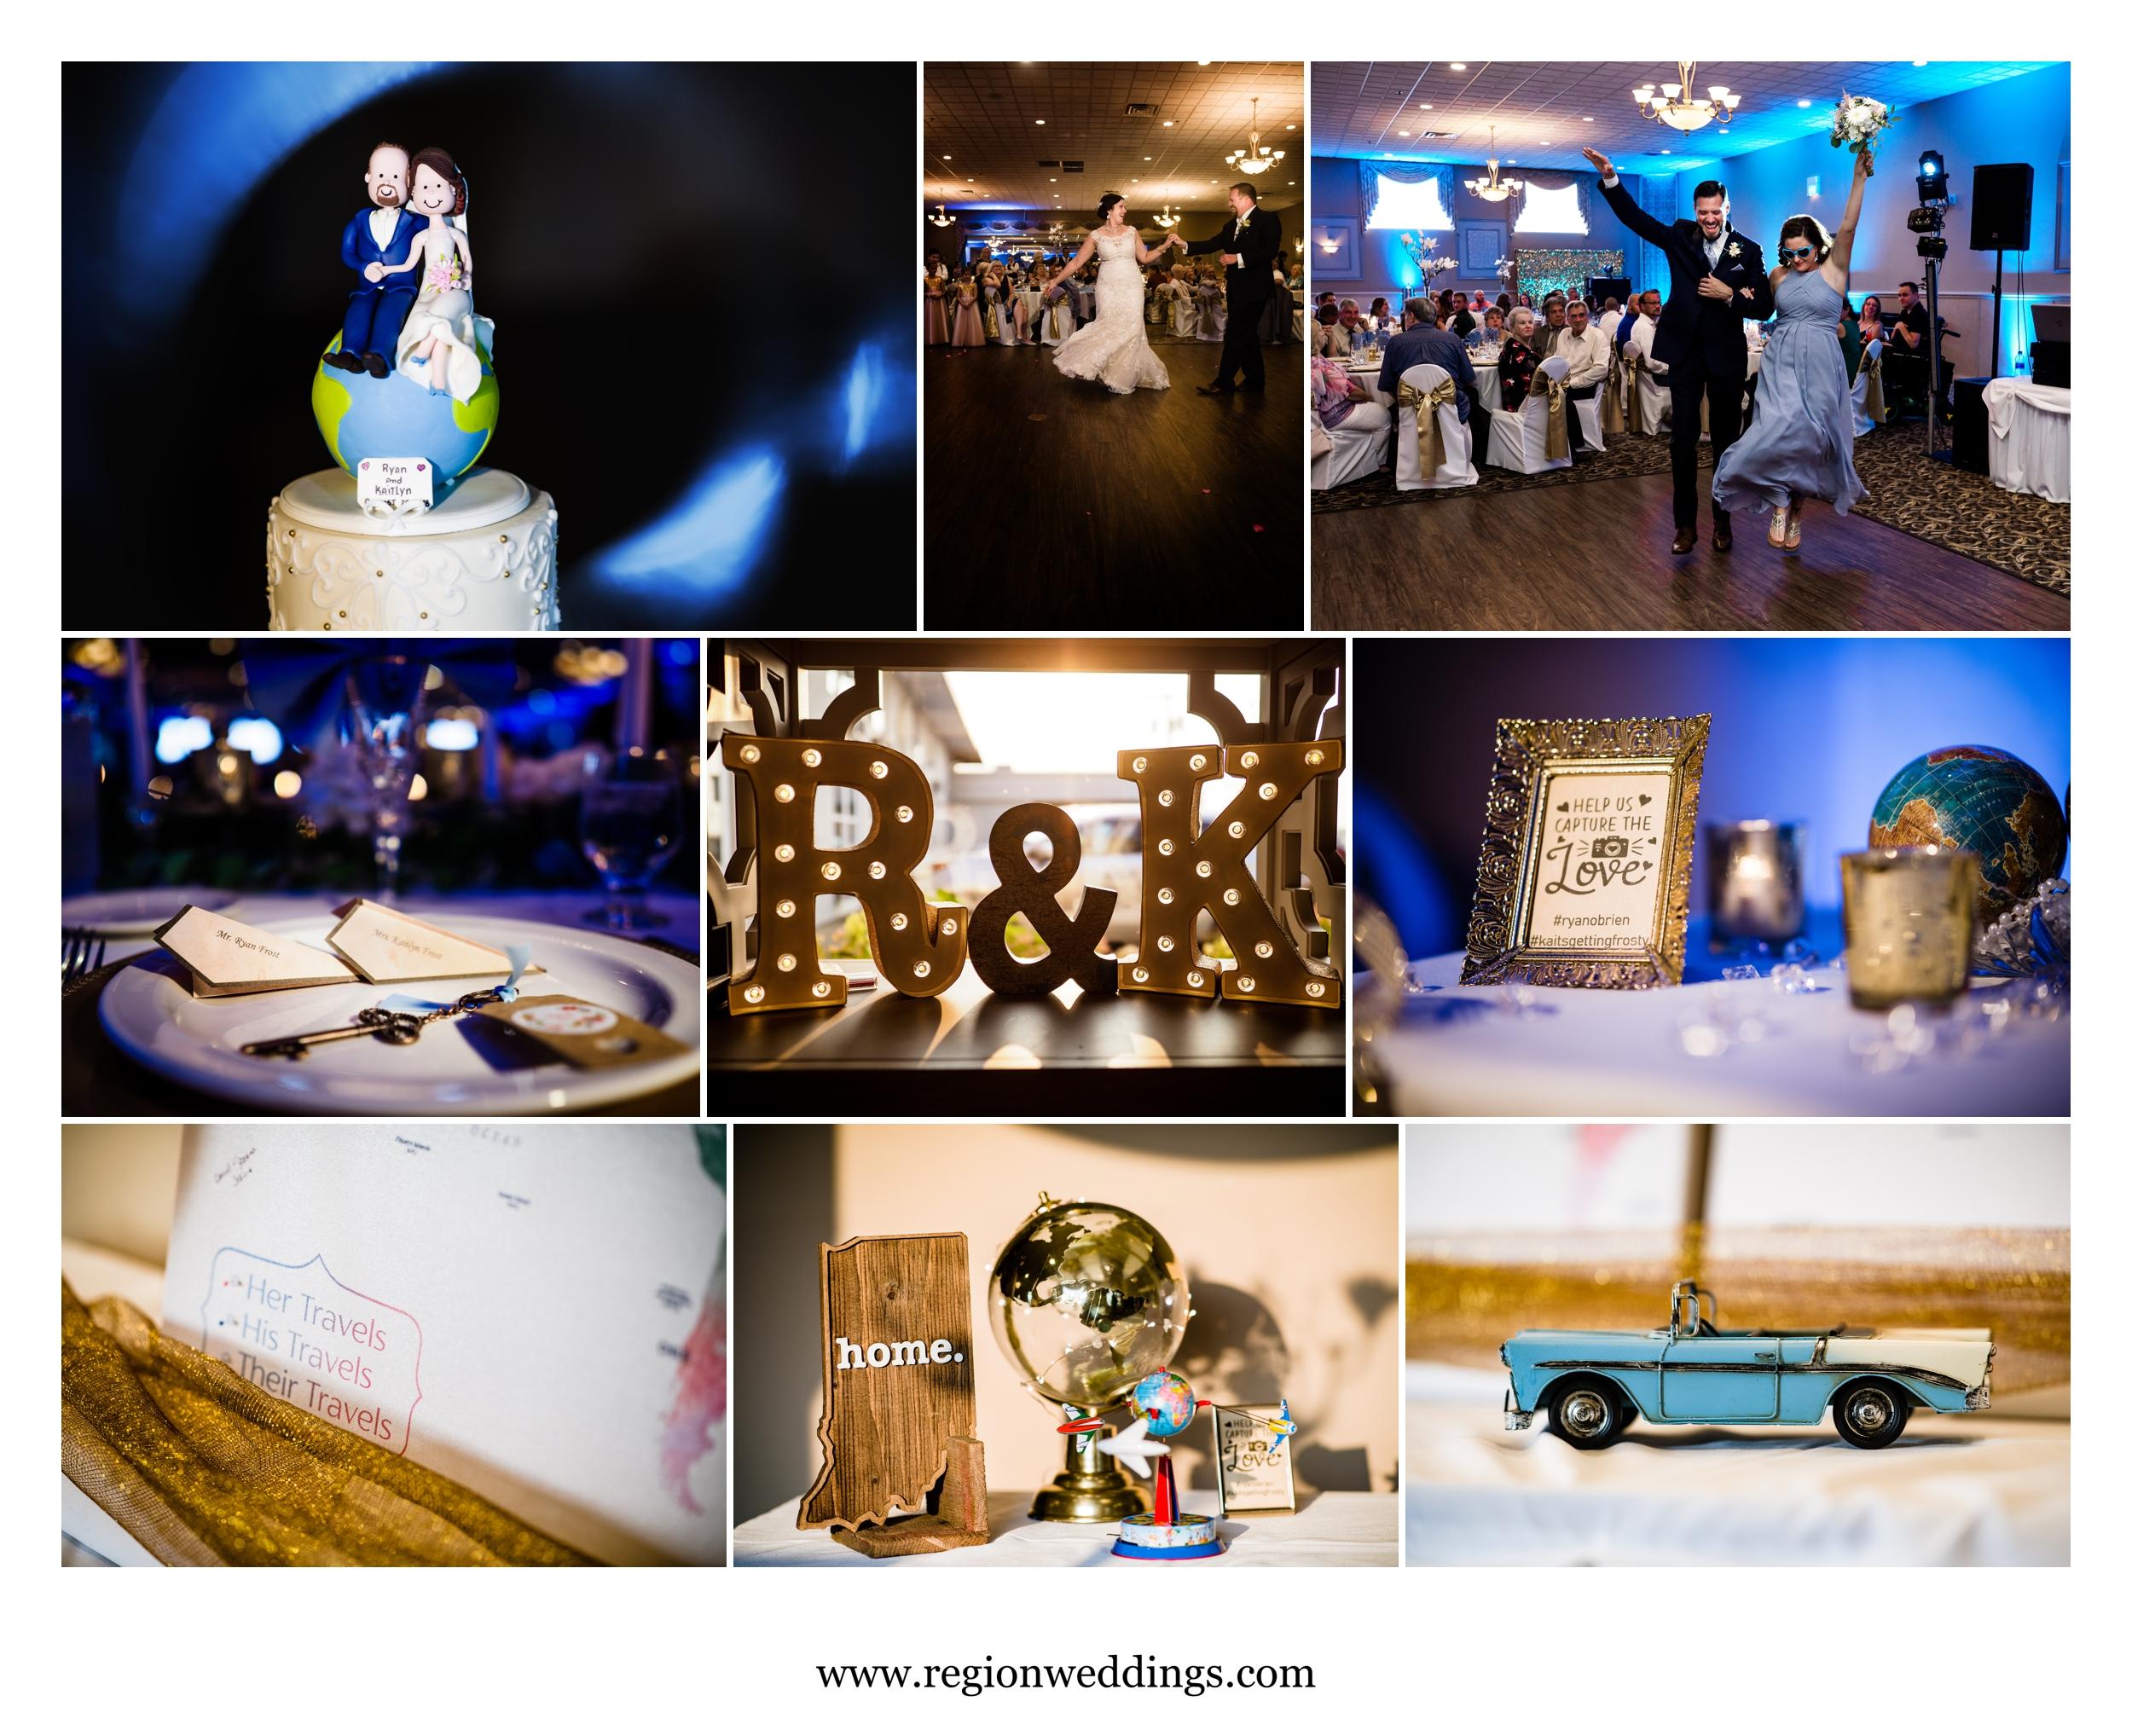 Travel themed wedding reception at Andorra Banquet Hall.